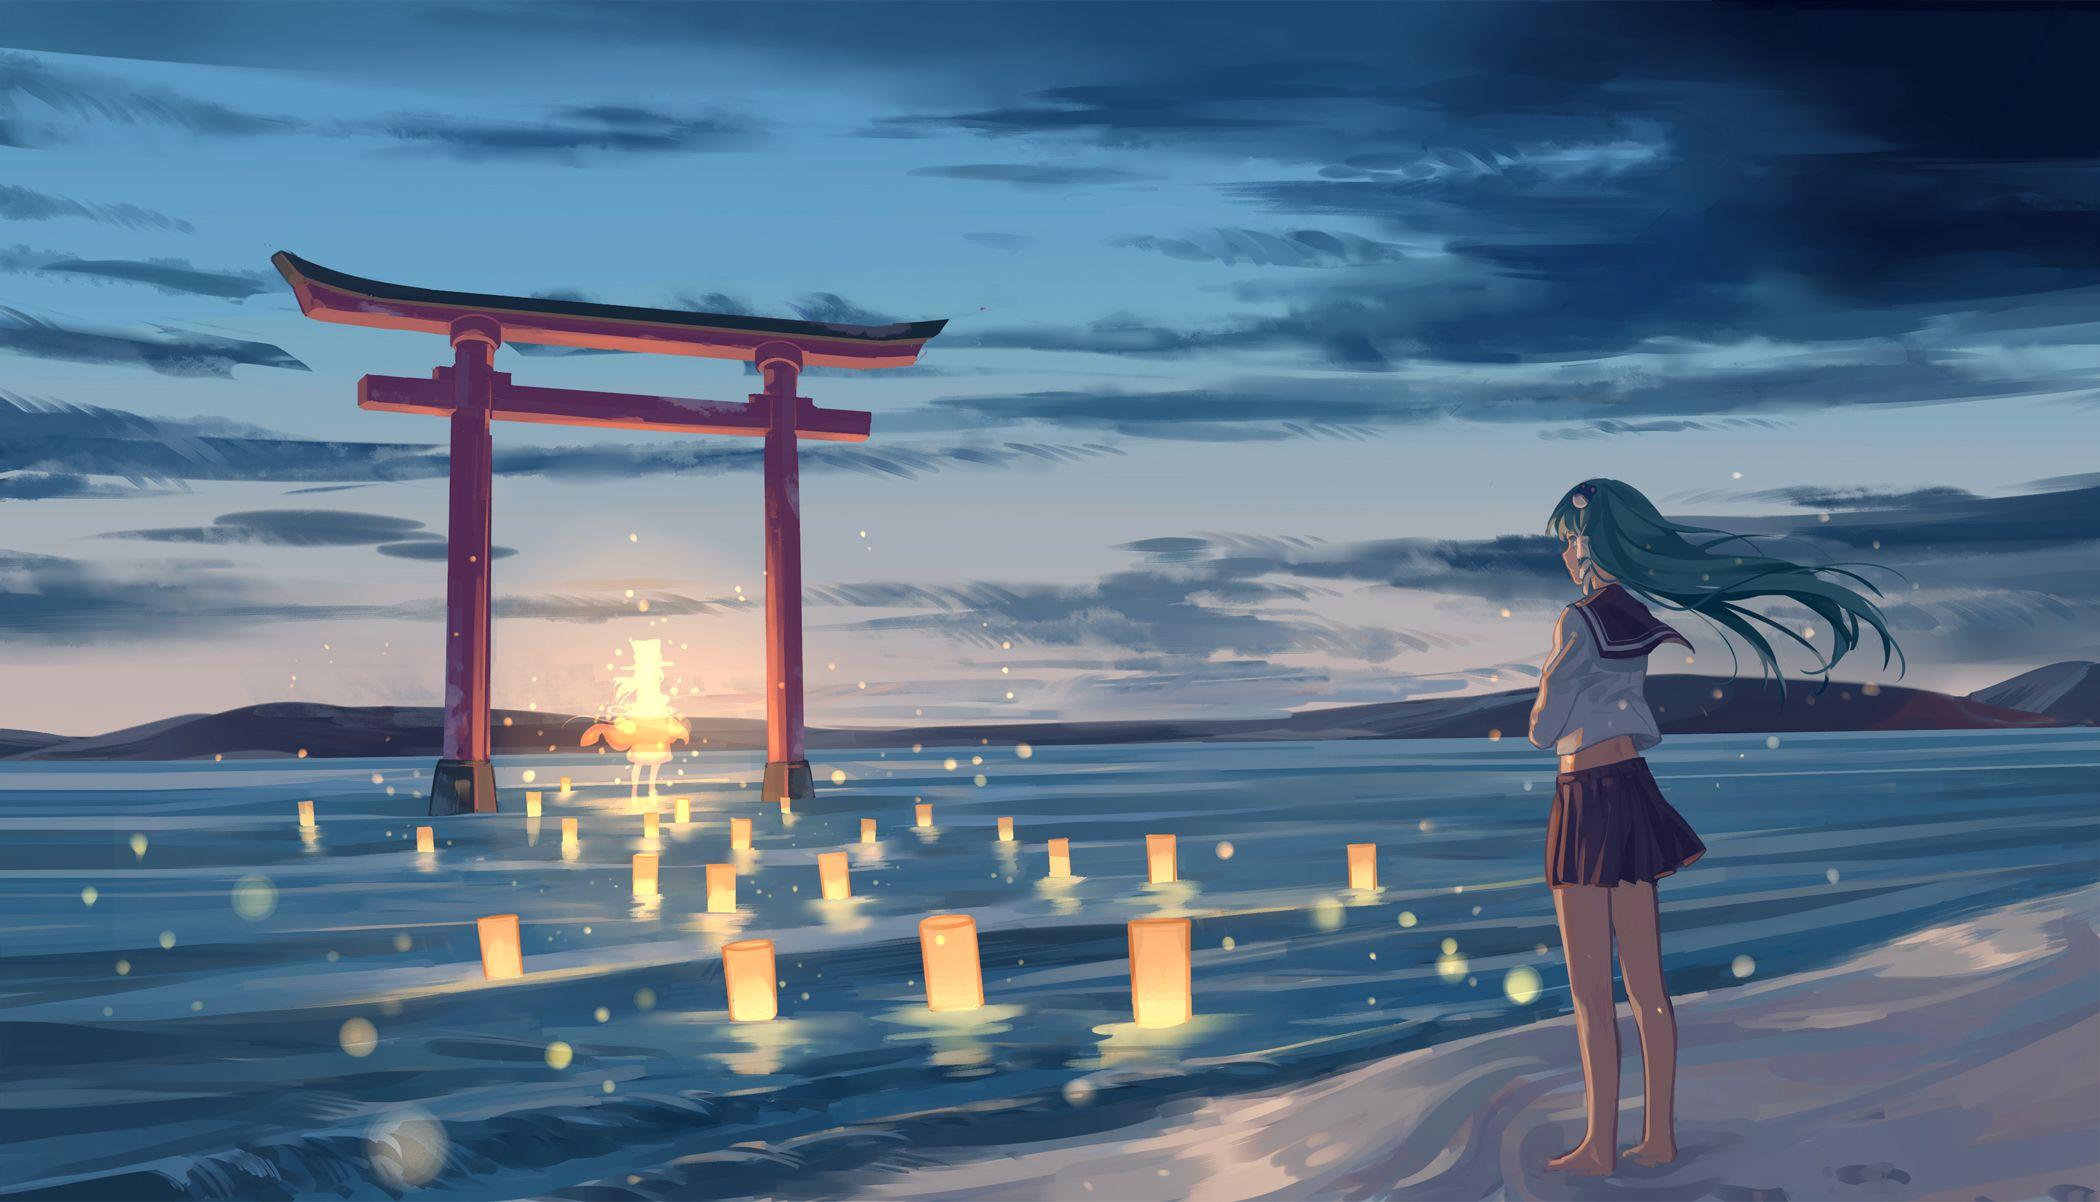 Anime Beach Wallpaper 21001202 Anime Scenery Wallpaper Anime Scenery Anime Life